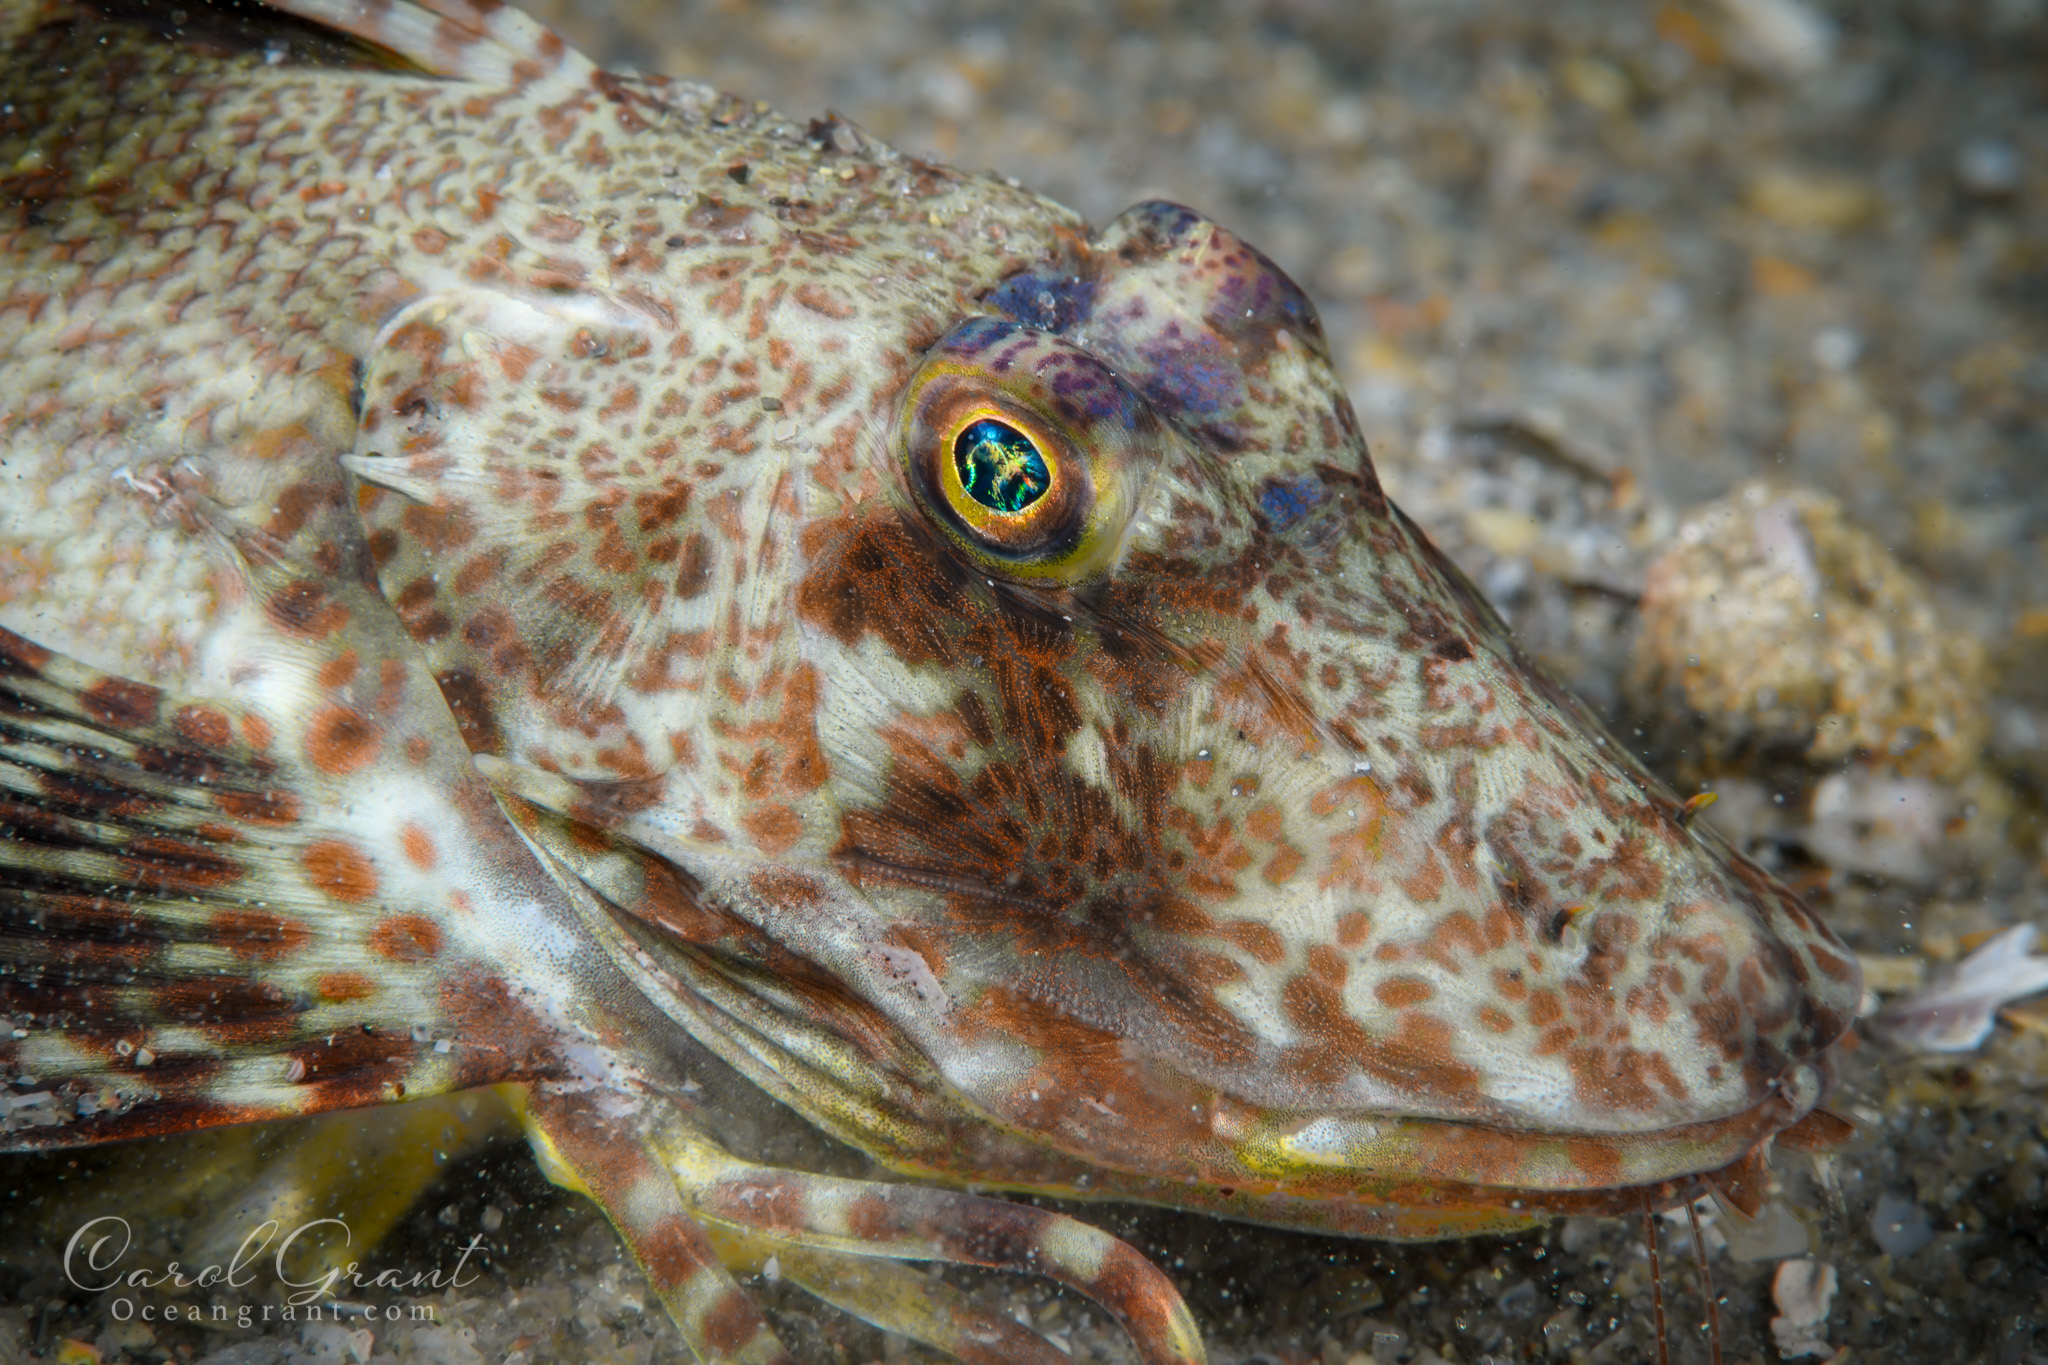 leopard searobin, underwater ©️CGrant/Oceangrant.com ,scuba diving,behavior,